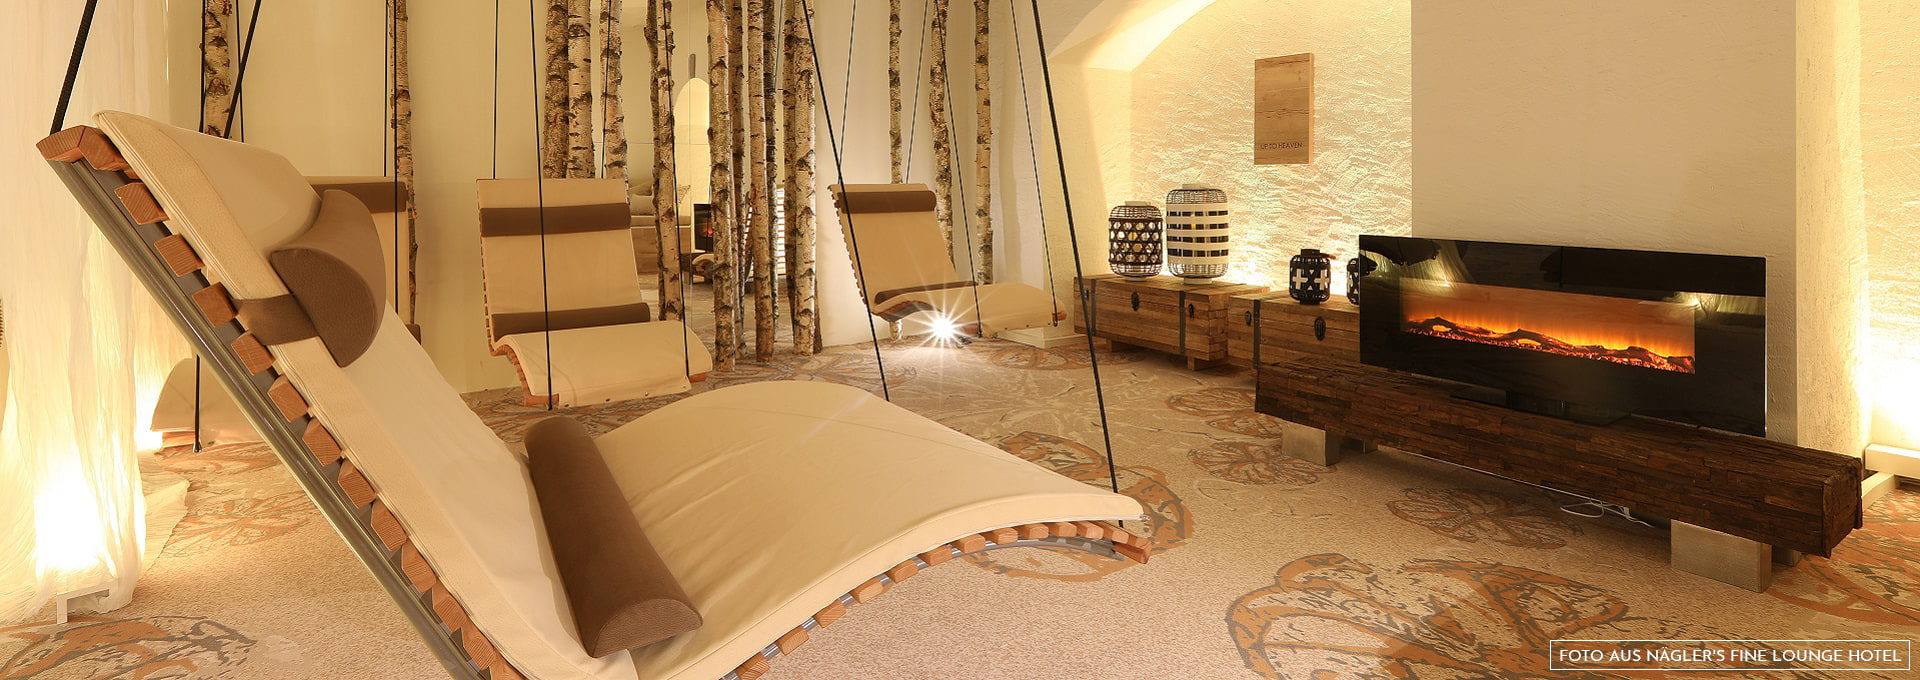 Hängeliegen im Spa Näglers Fine Lounge Hotel Oestrich-Winkel